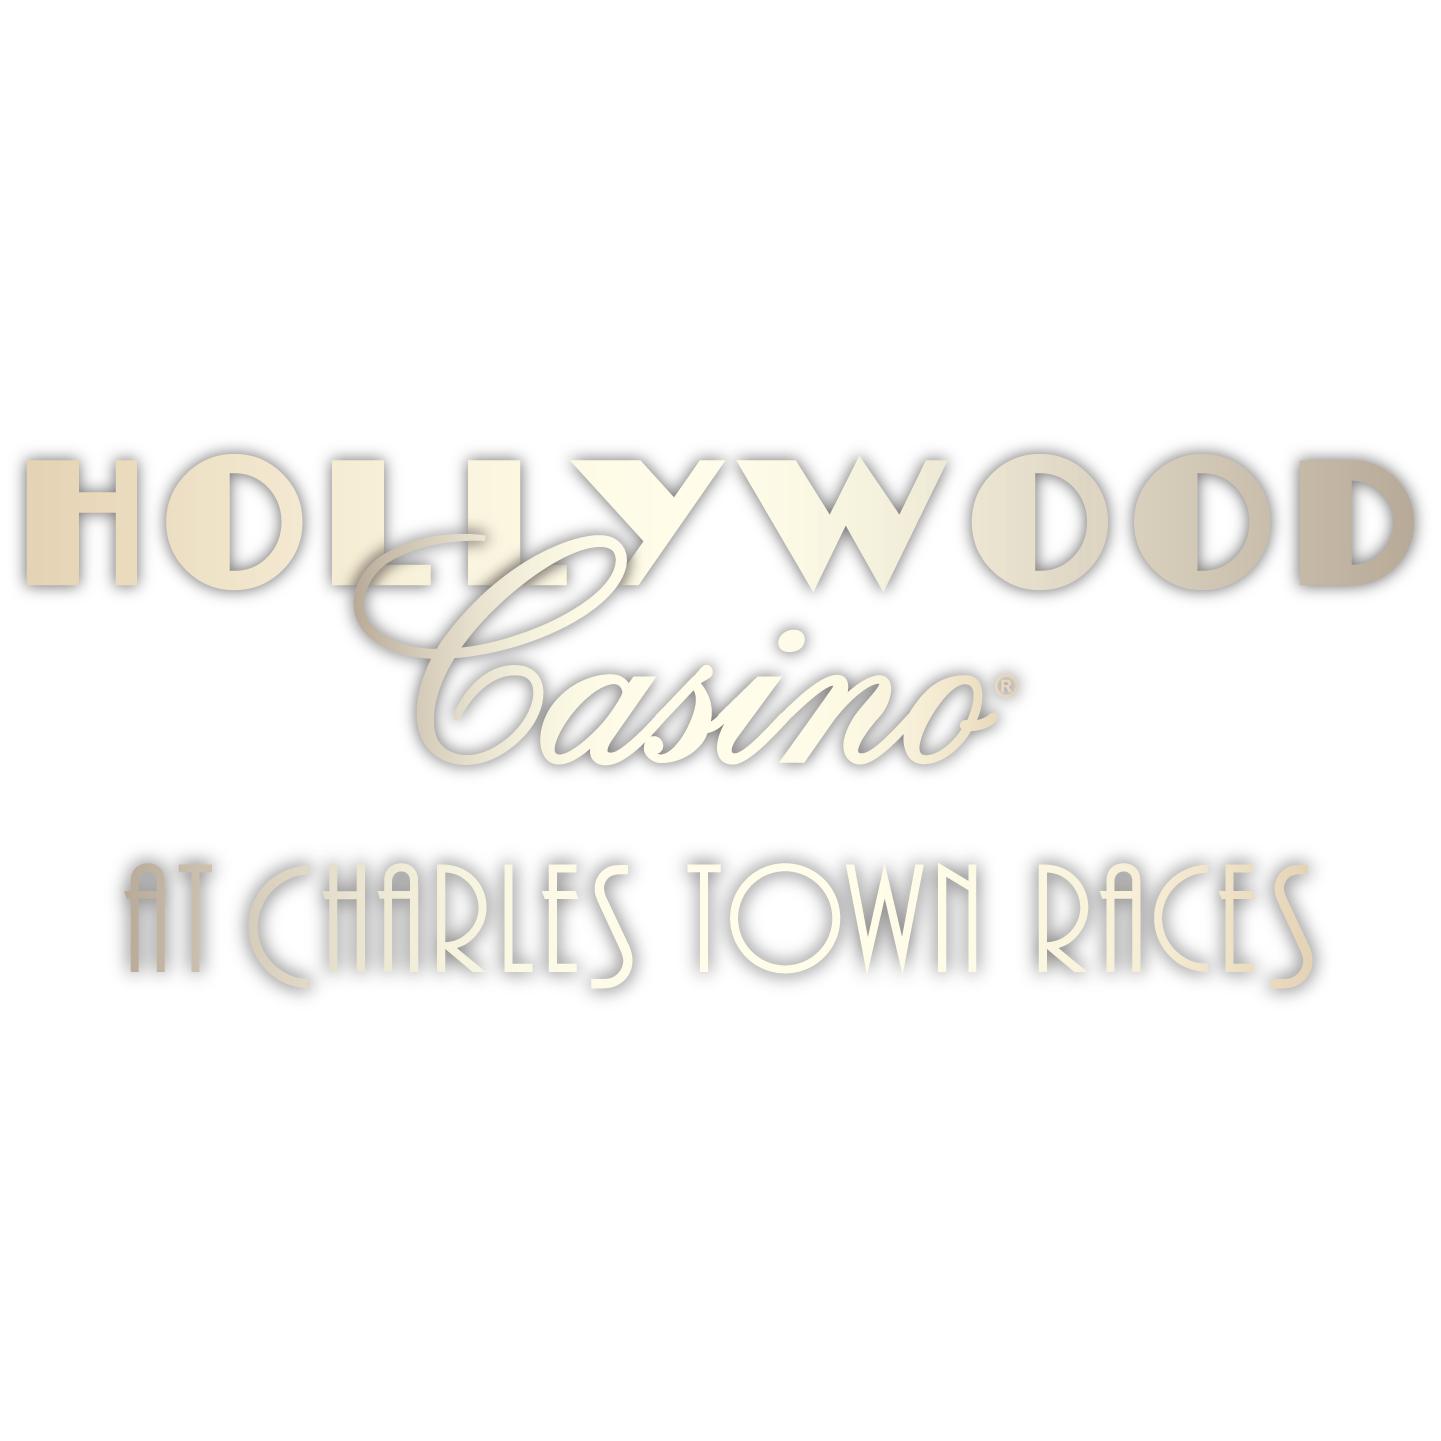 West virginia casinos address